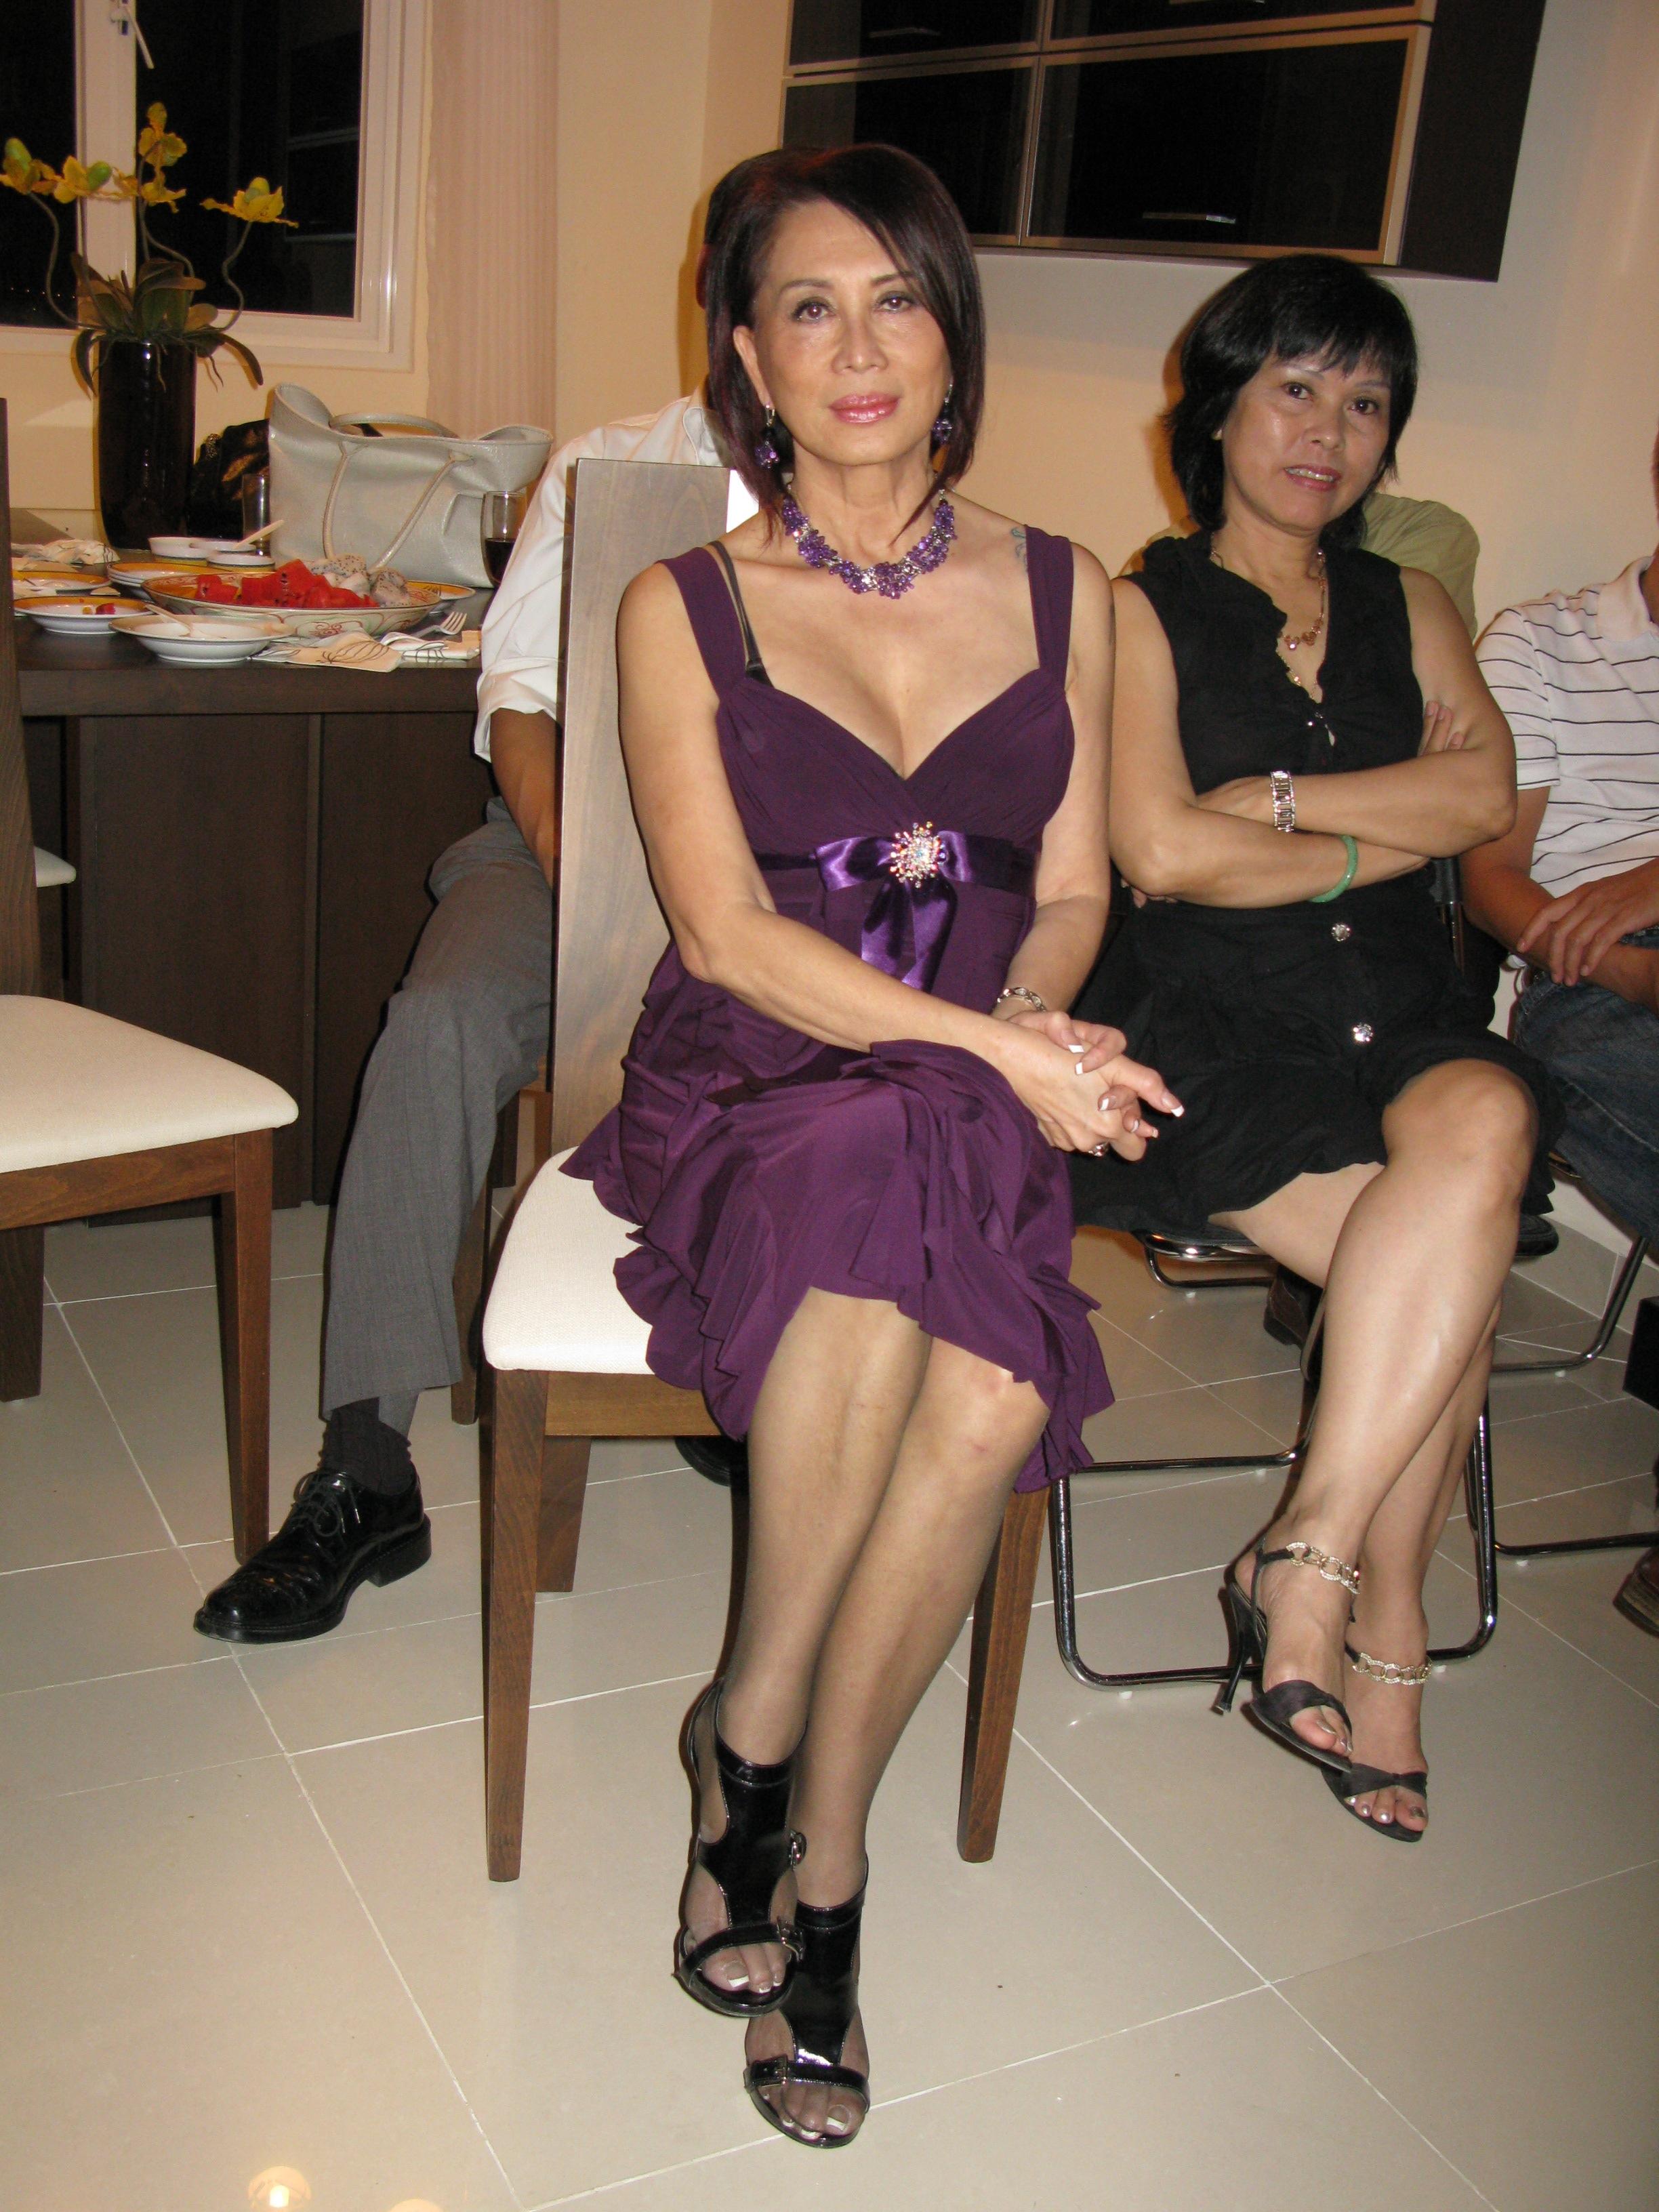 vietnamese milf vietnam milf vietnamese milf porn vietnamese milf porn vietnamese aunty gilf jpg